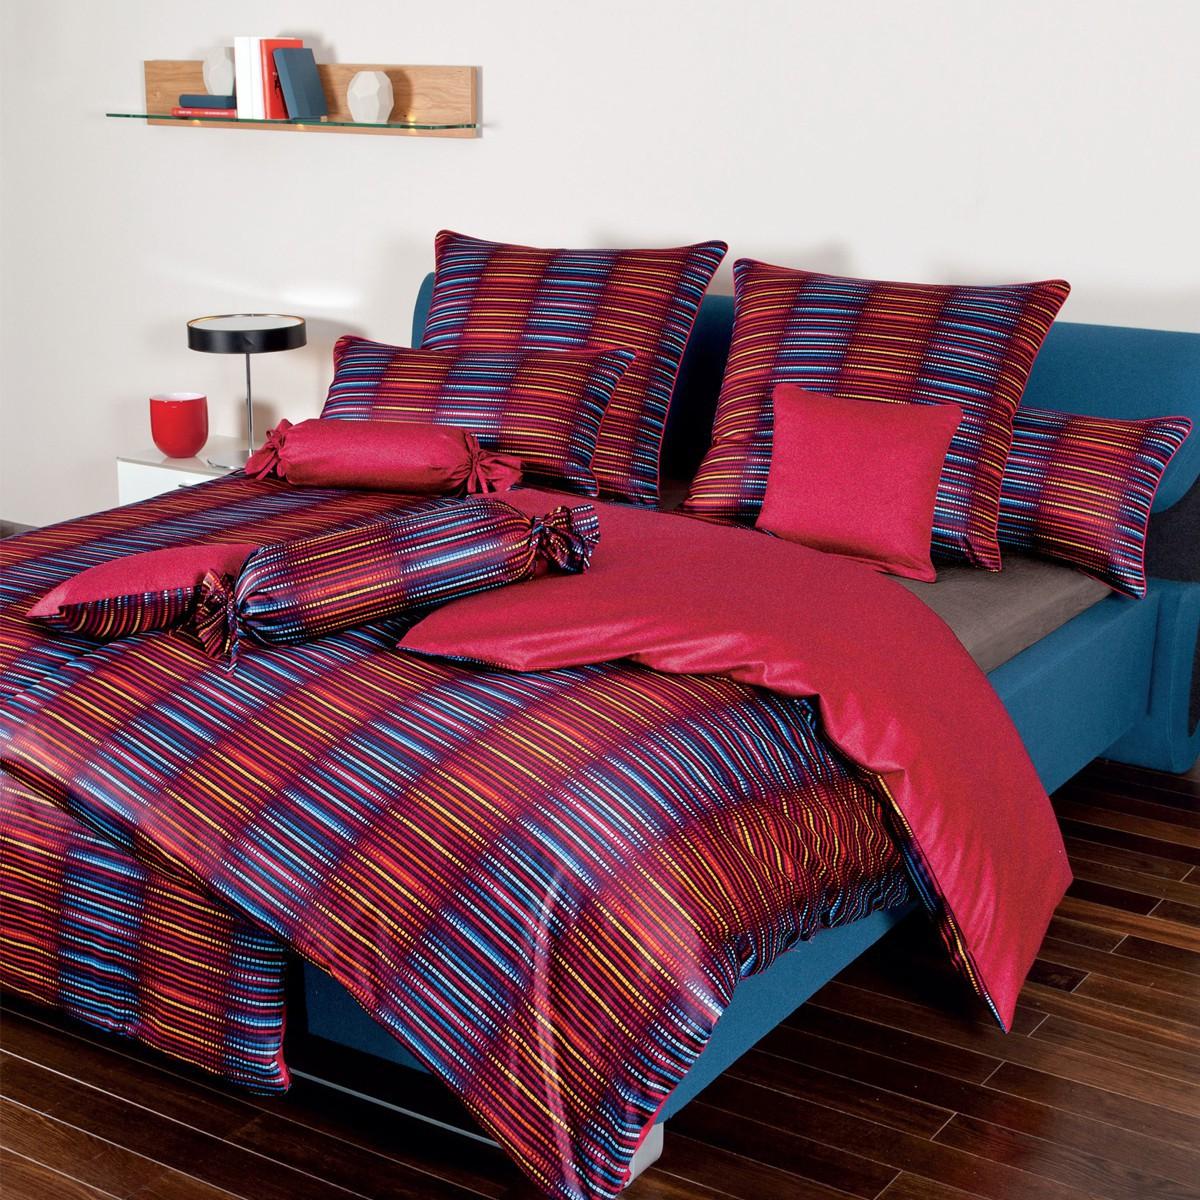 janine interlock feinjersey bettw sche carmen 5457 01 rot orange blau 3967. Black Bedroom Furniture Sets. Home Design Ideas